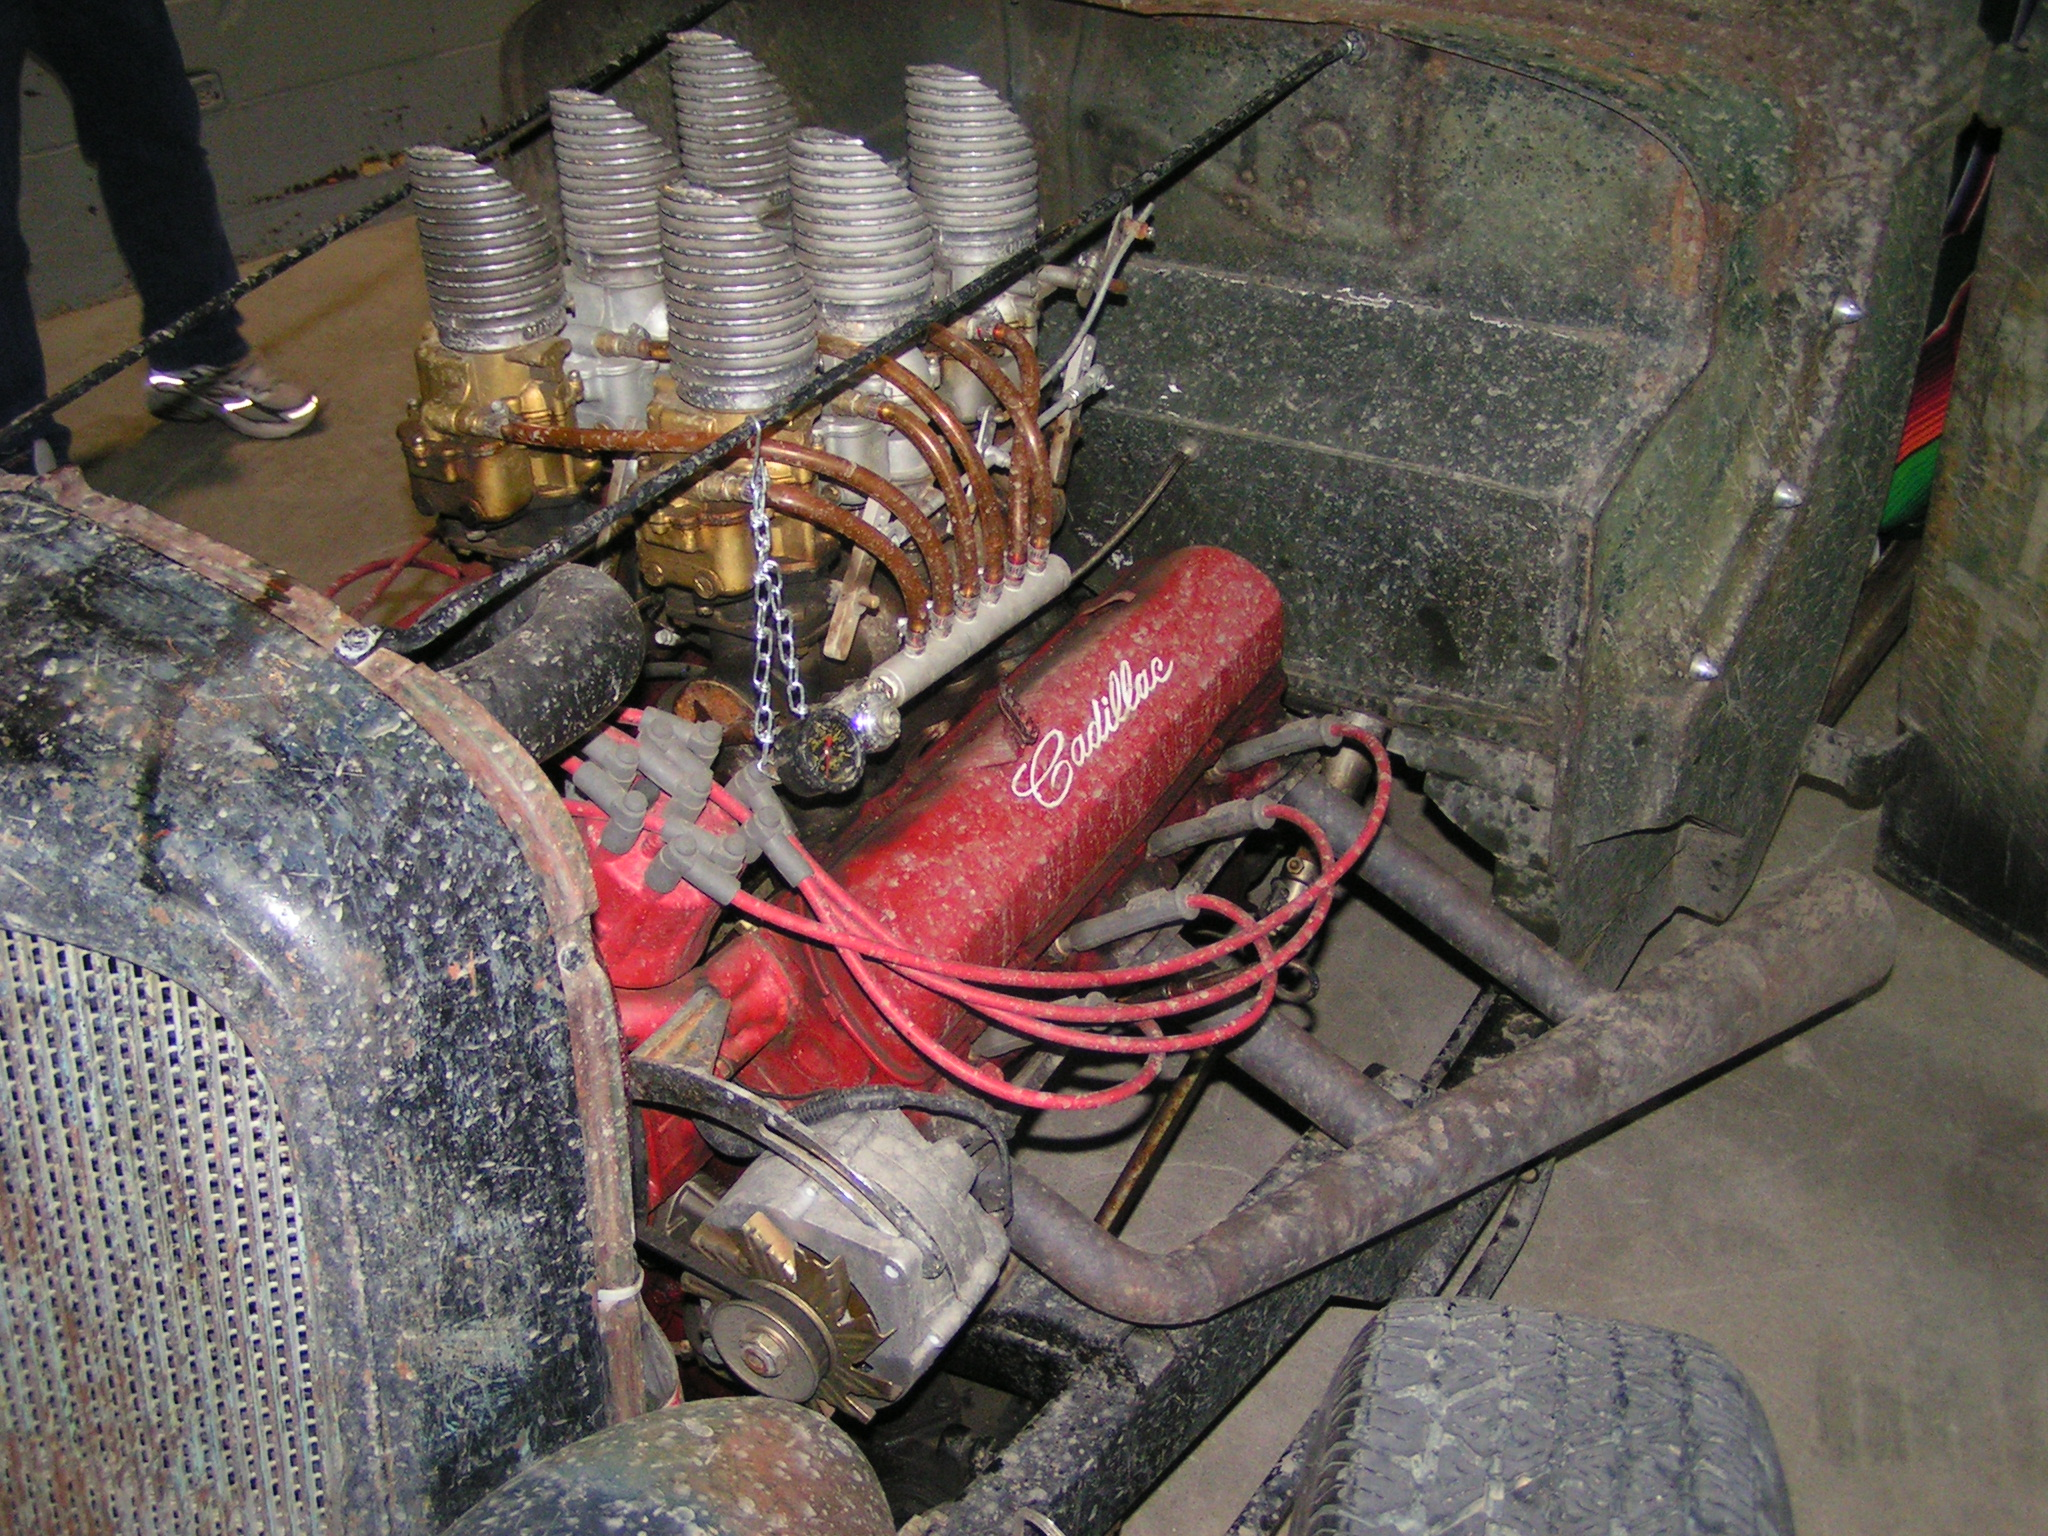 file:1938 ford truck - cadillac 429 v8 - velocity stacks (2332160548) jpg